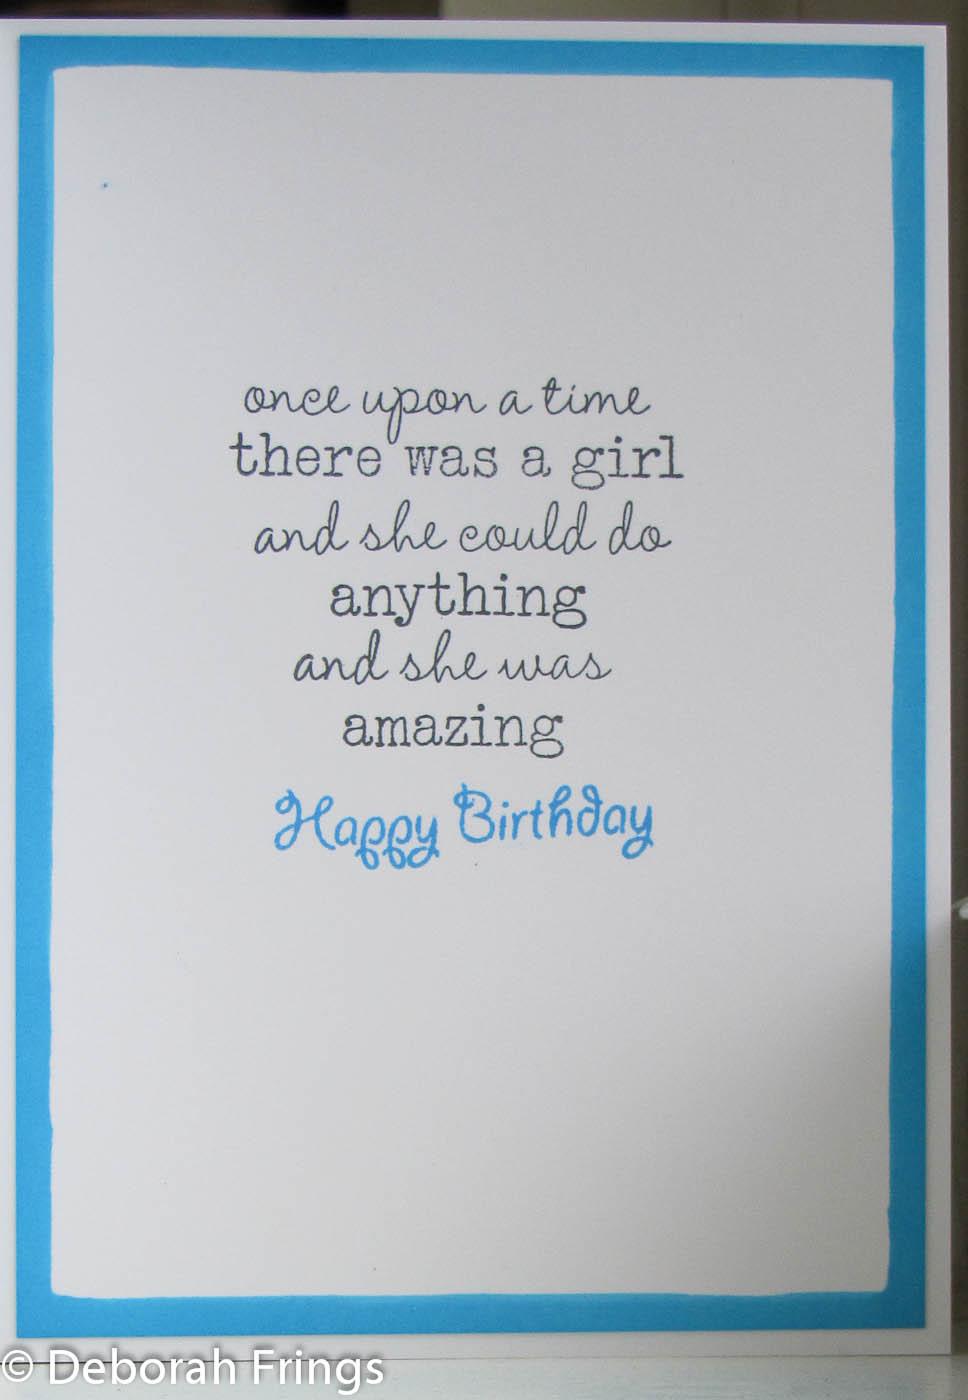 Deborahs Gems Sweetest Birthday Wishes